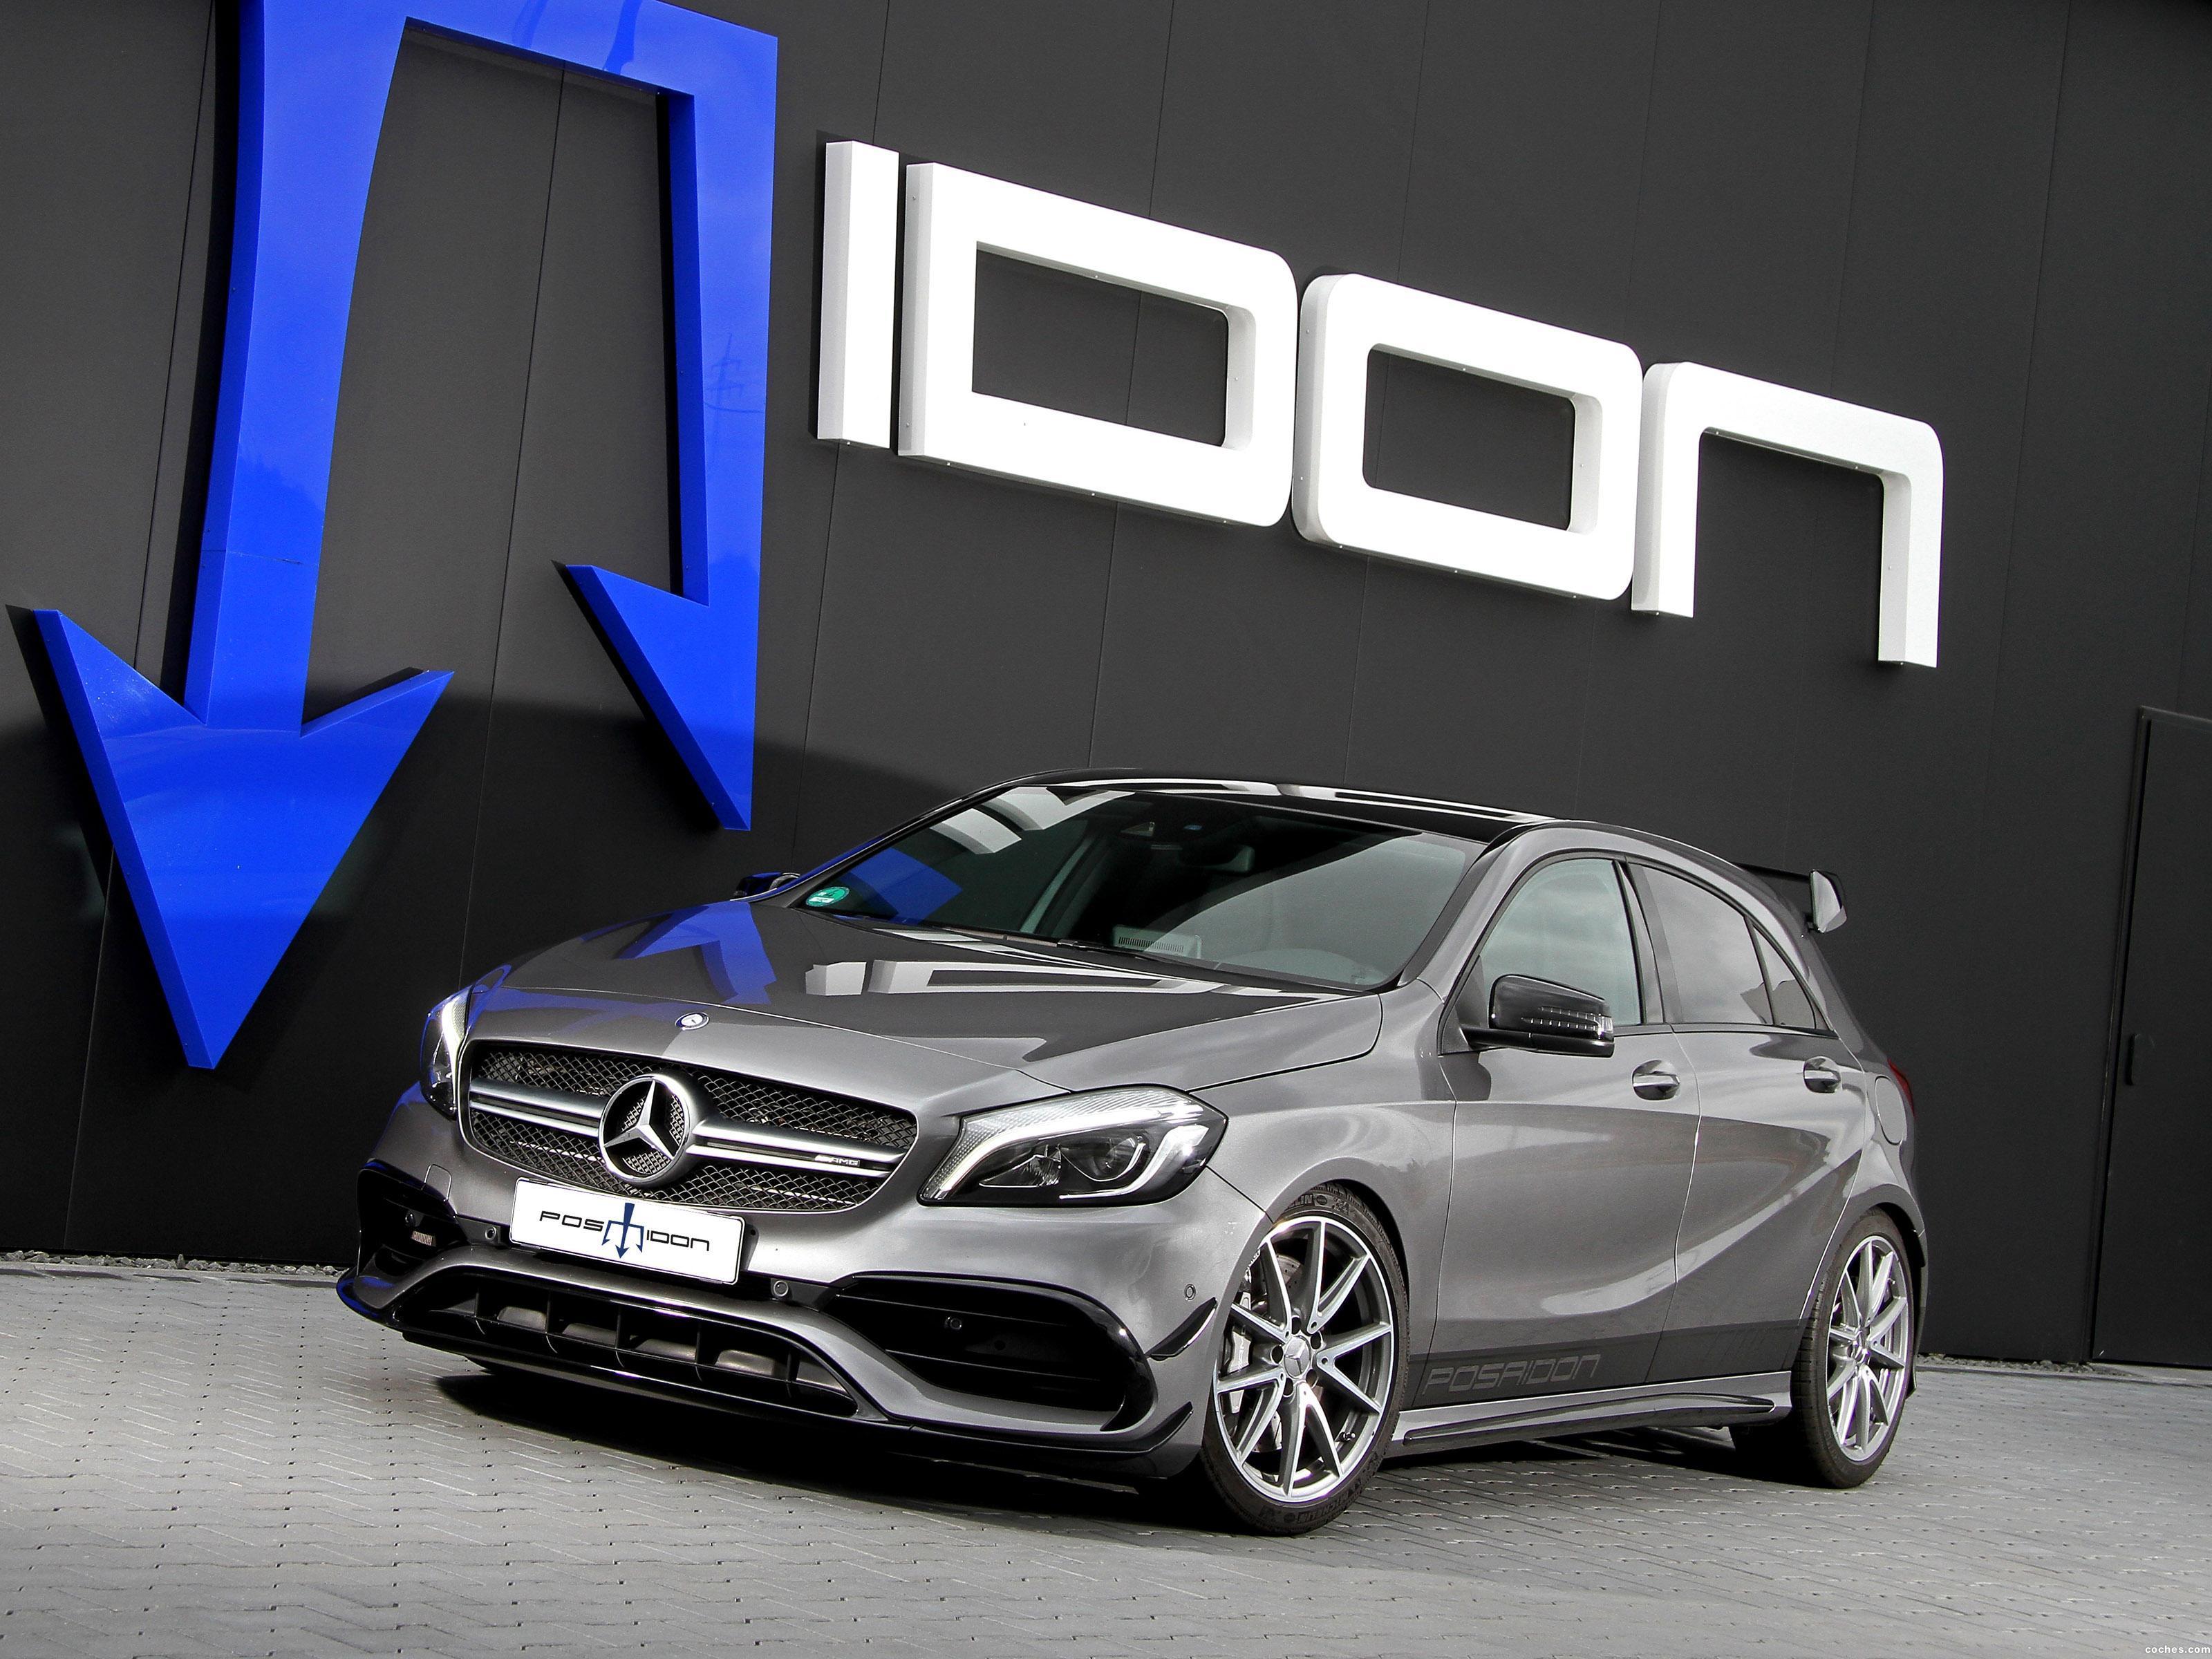 Foto 0 de Posaidon Mercedes-AMG A45 RS 485 W176 2018